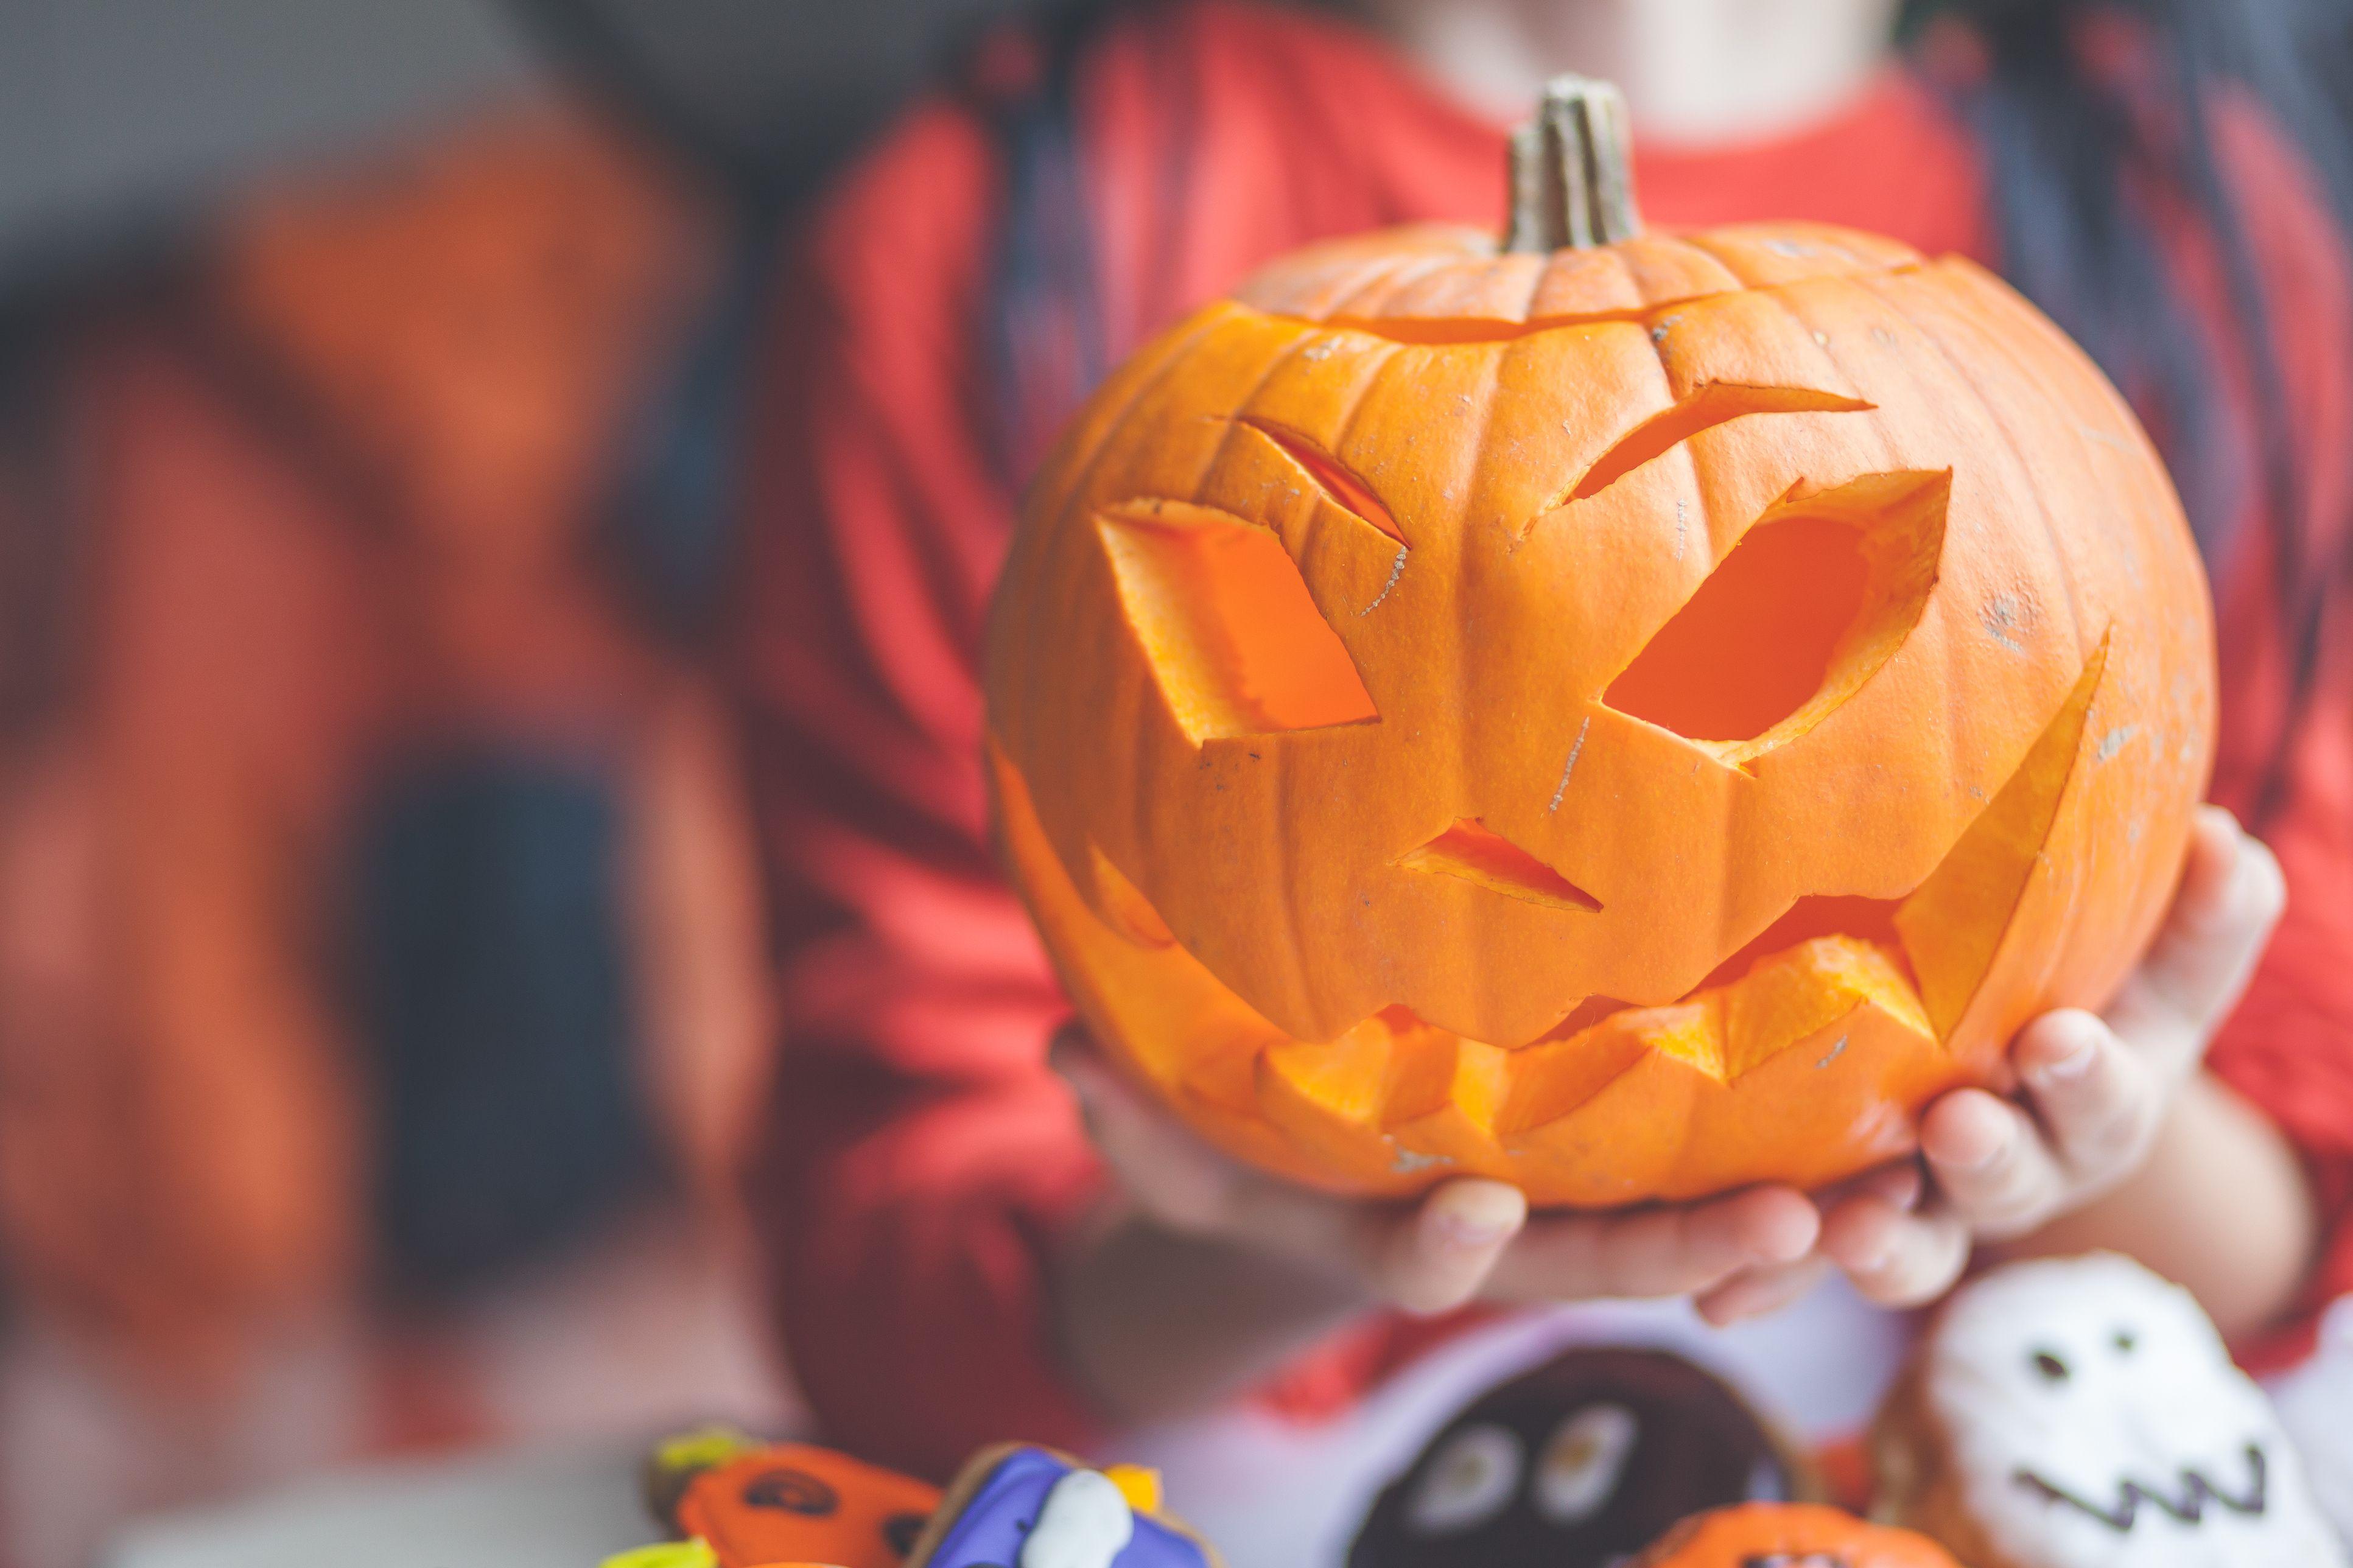 30 fun halloween trivia & facts - interesting halloween stats